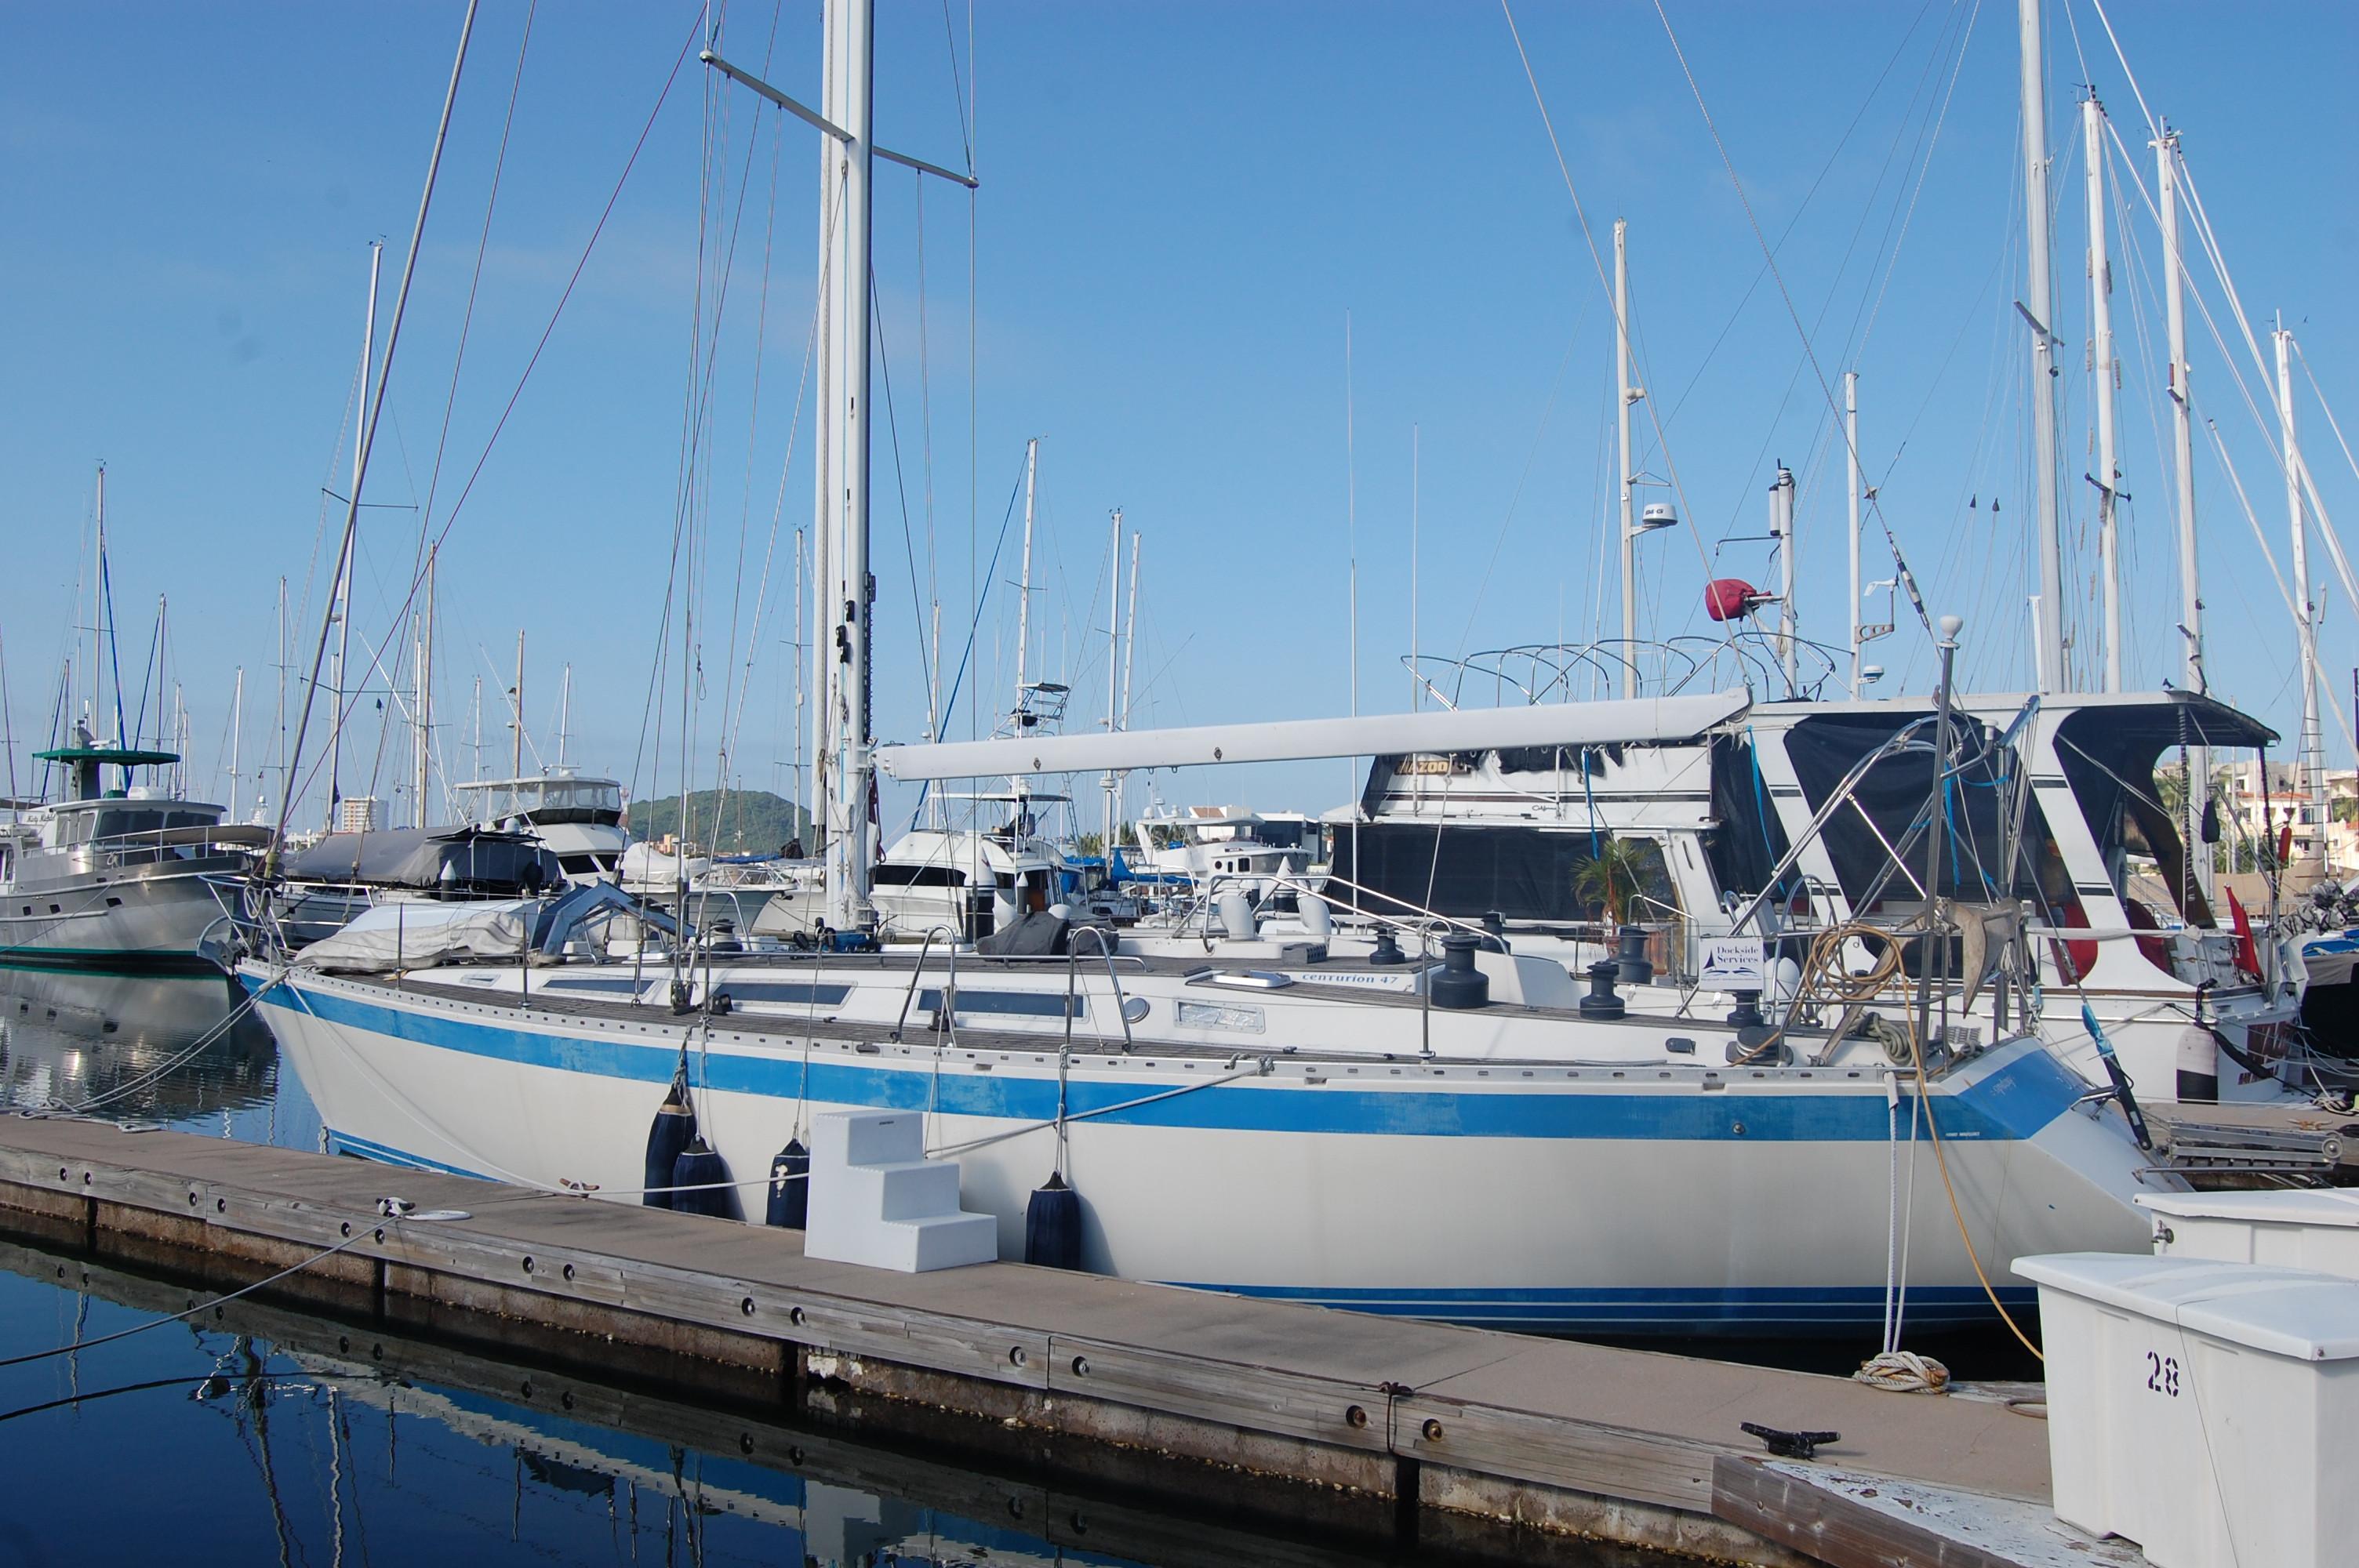 47' Wauquiez Centurion 47+Boat for sale!